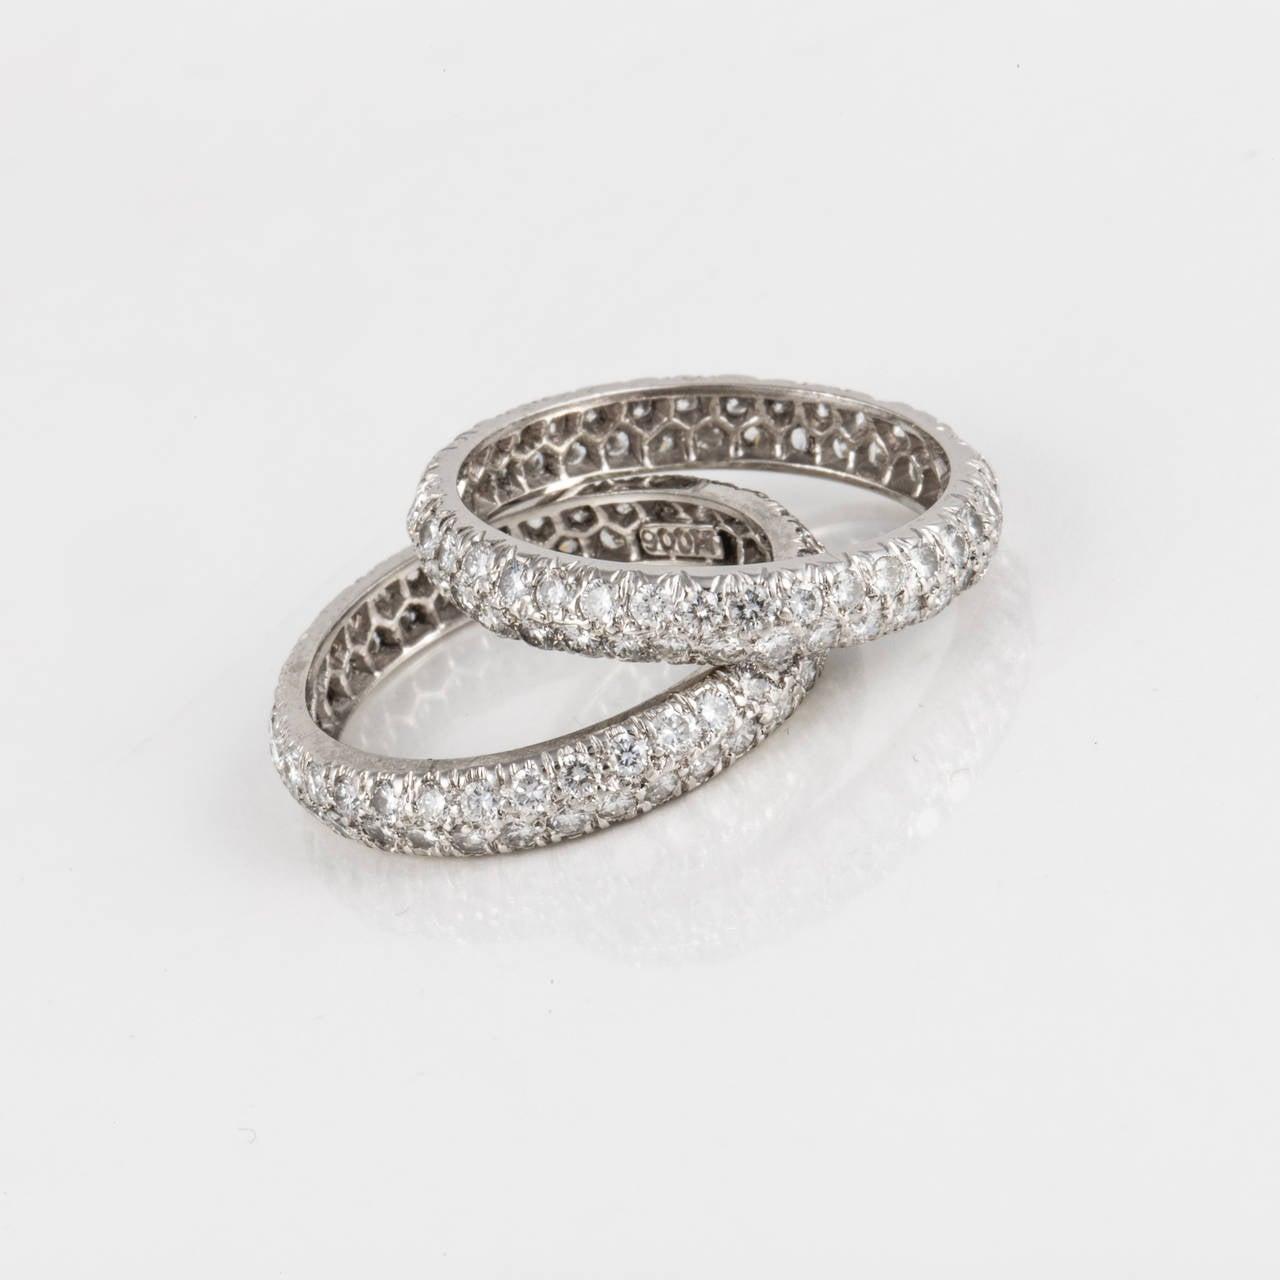 david webb pair of platinum eternity band rings